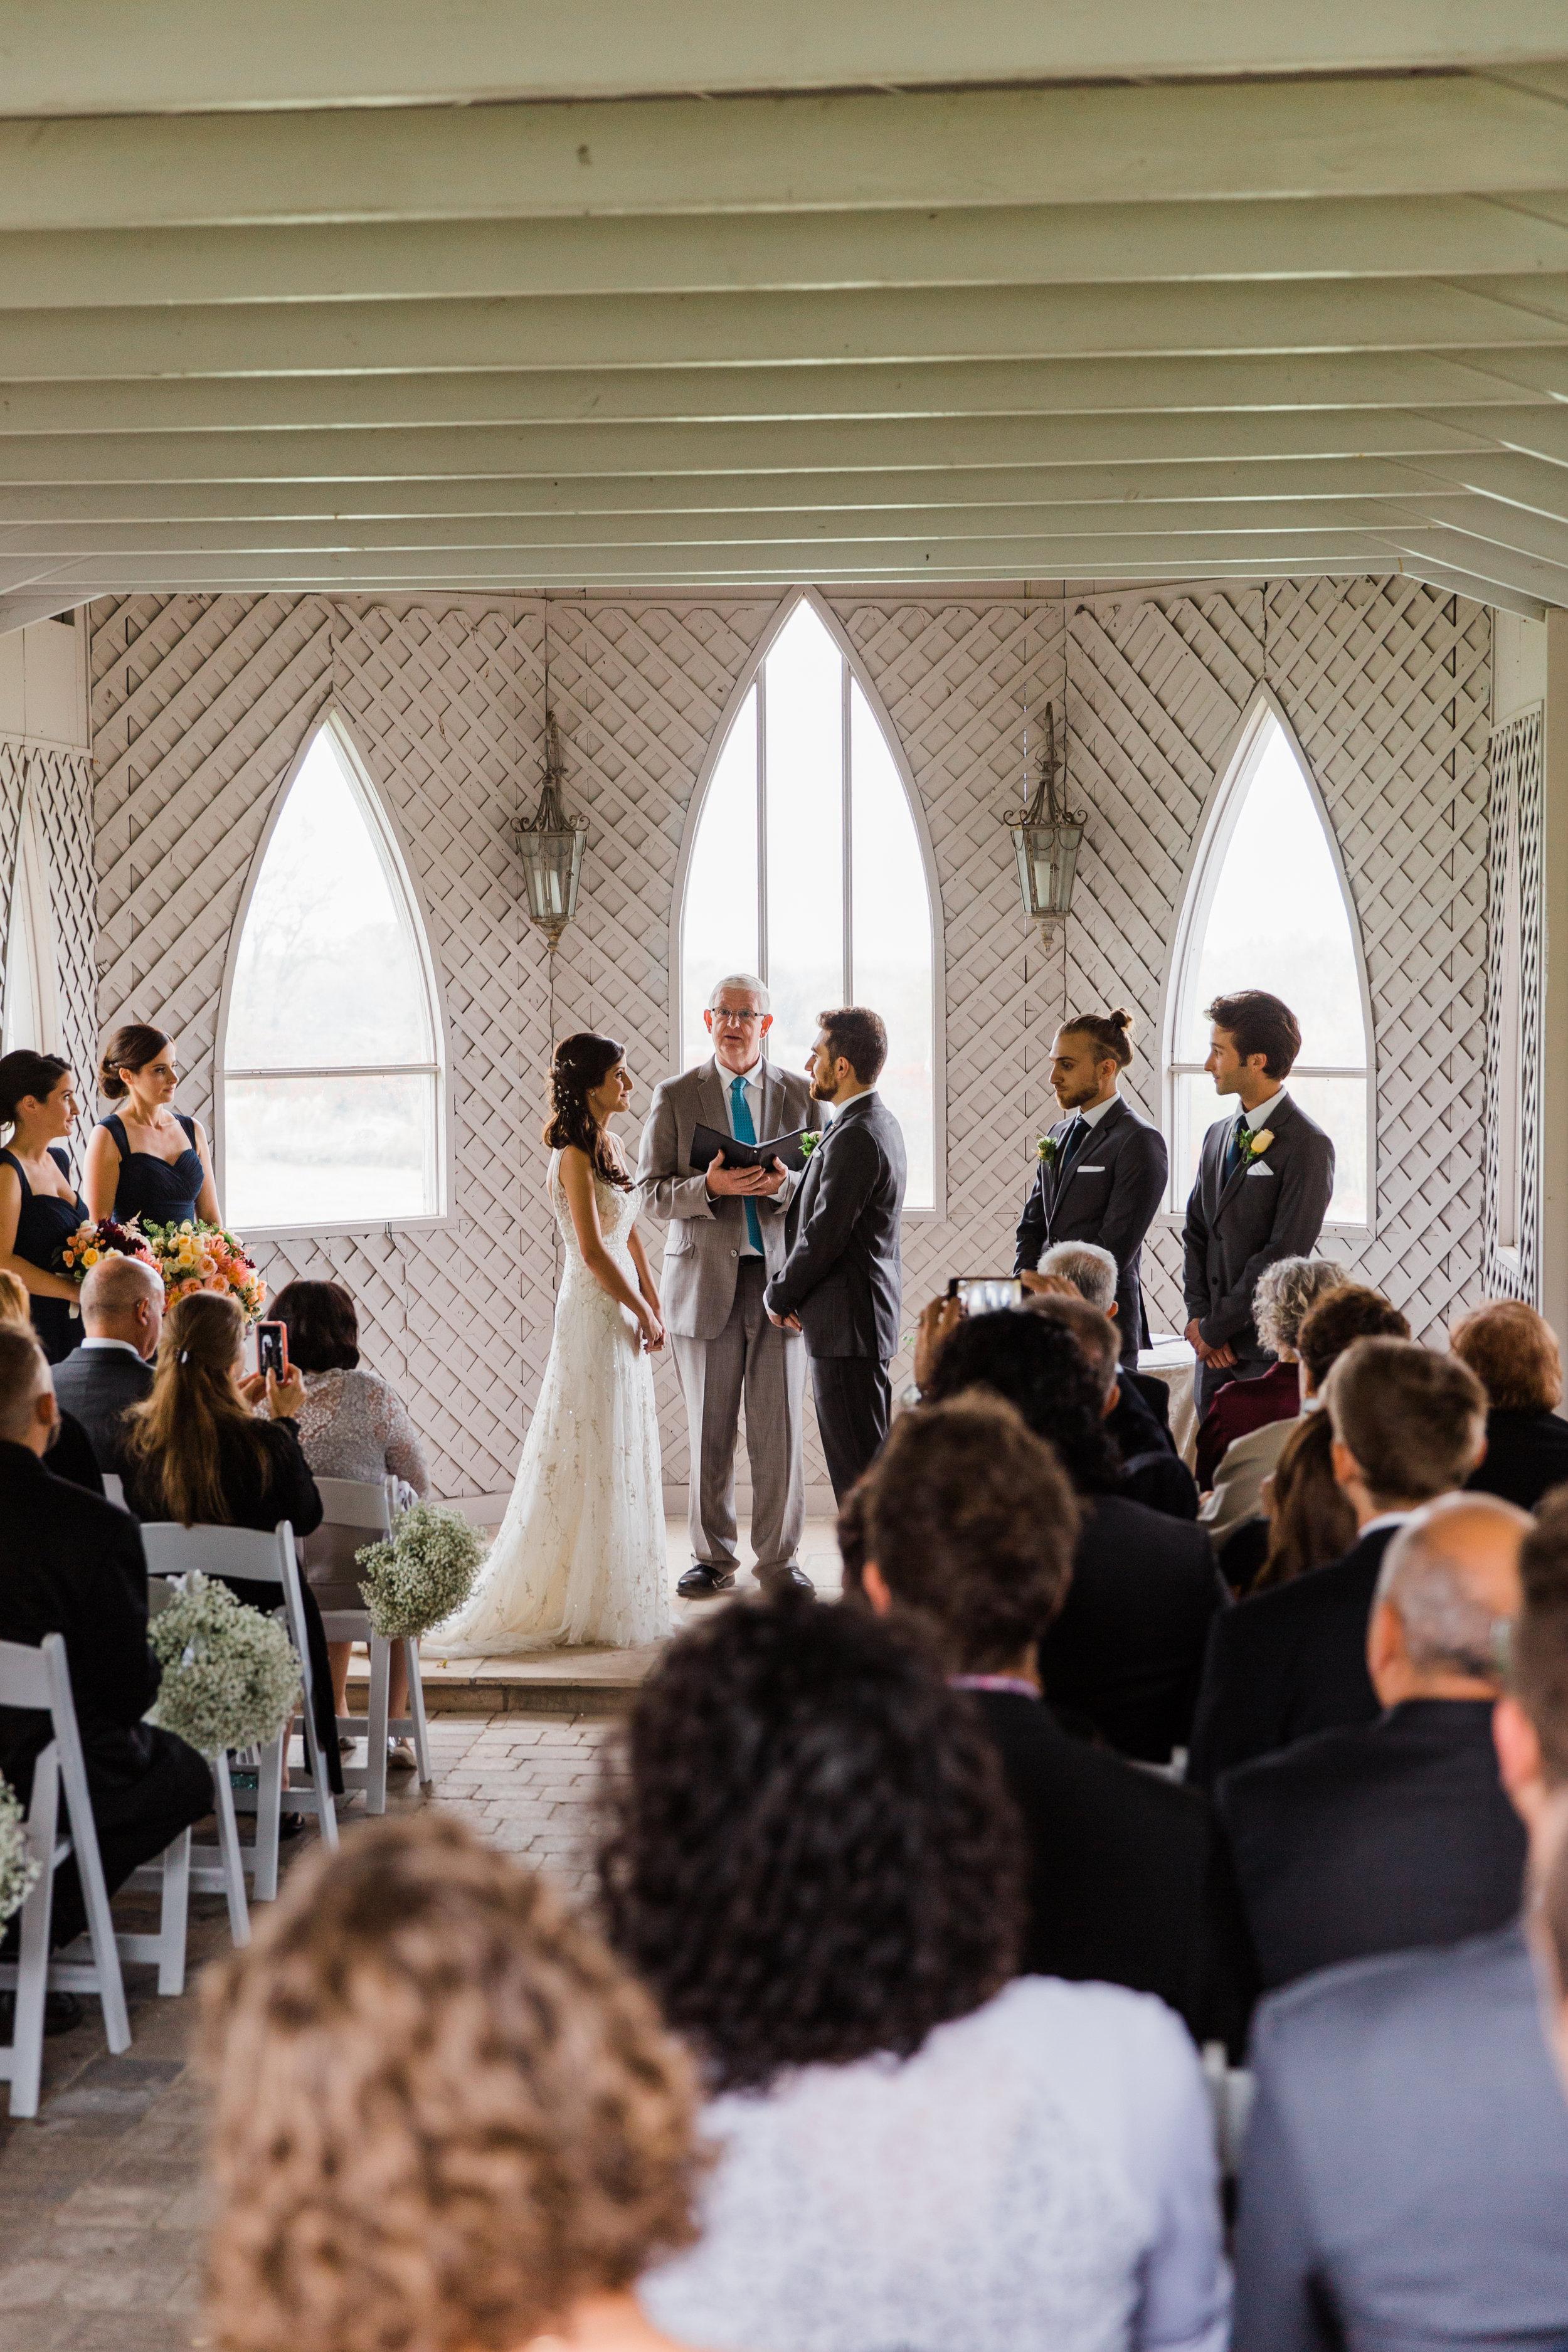 Amir-Golbazi-Danielle-Giroux-Photography_Toronto-Wedding_Cedarwood_Rachel-Paul_178.jpg